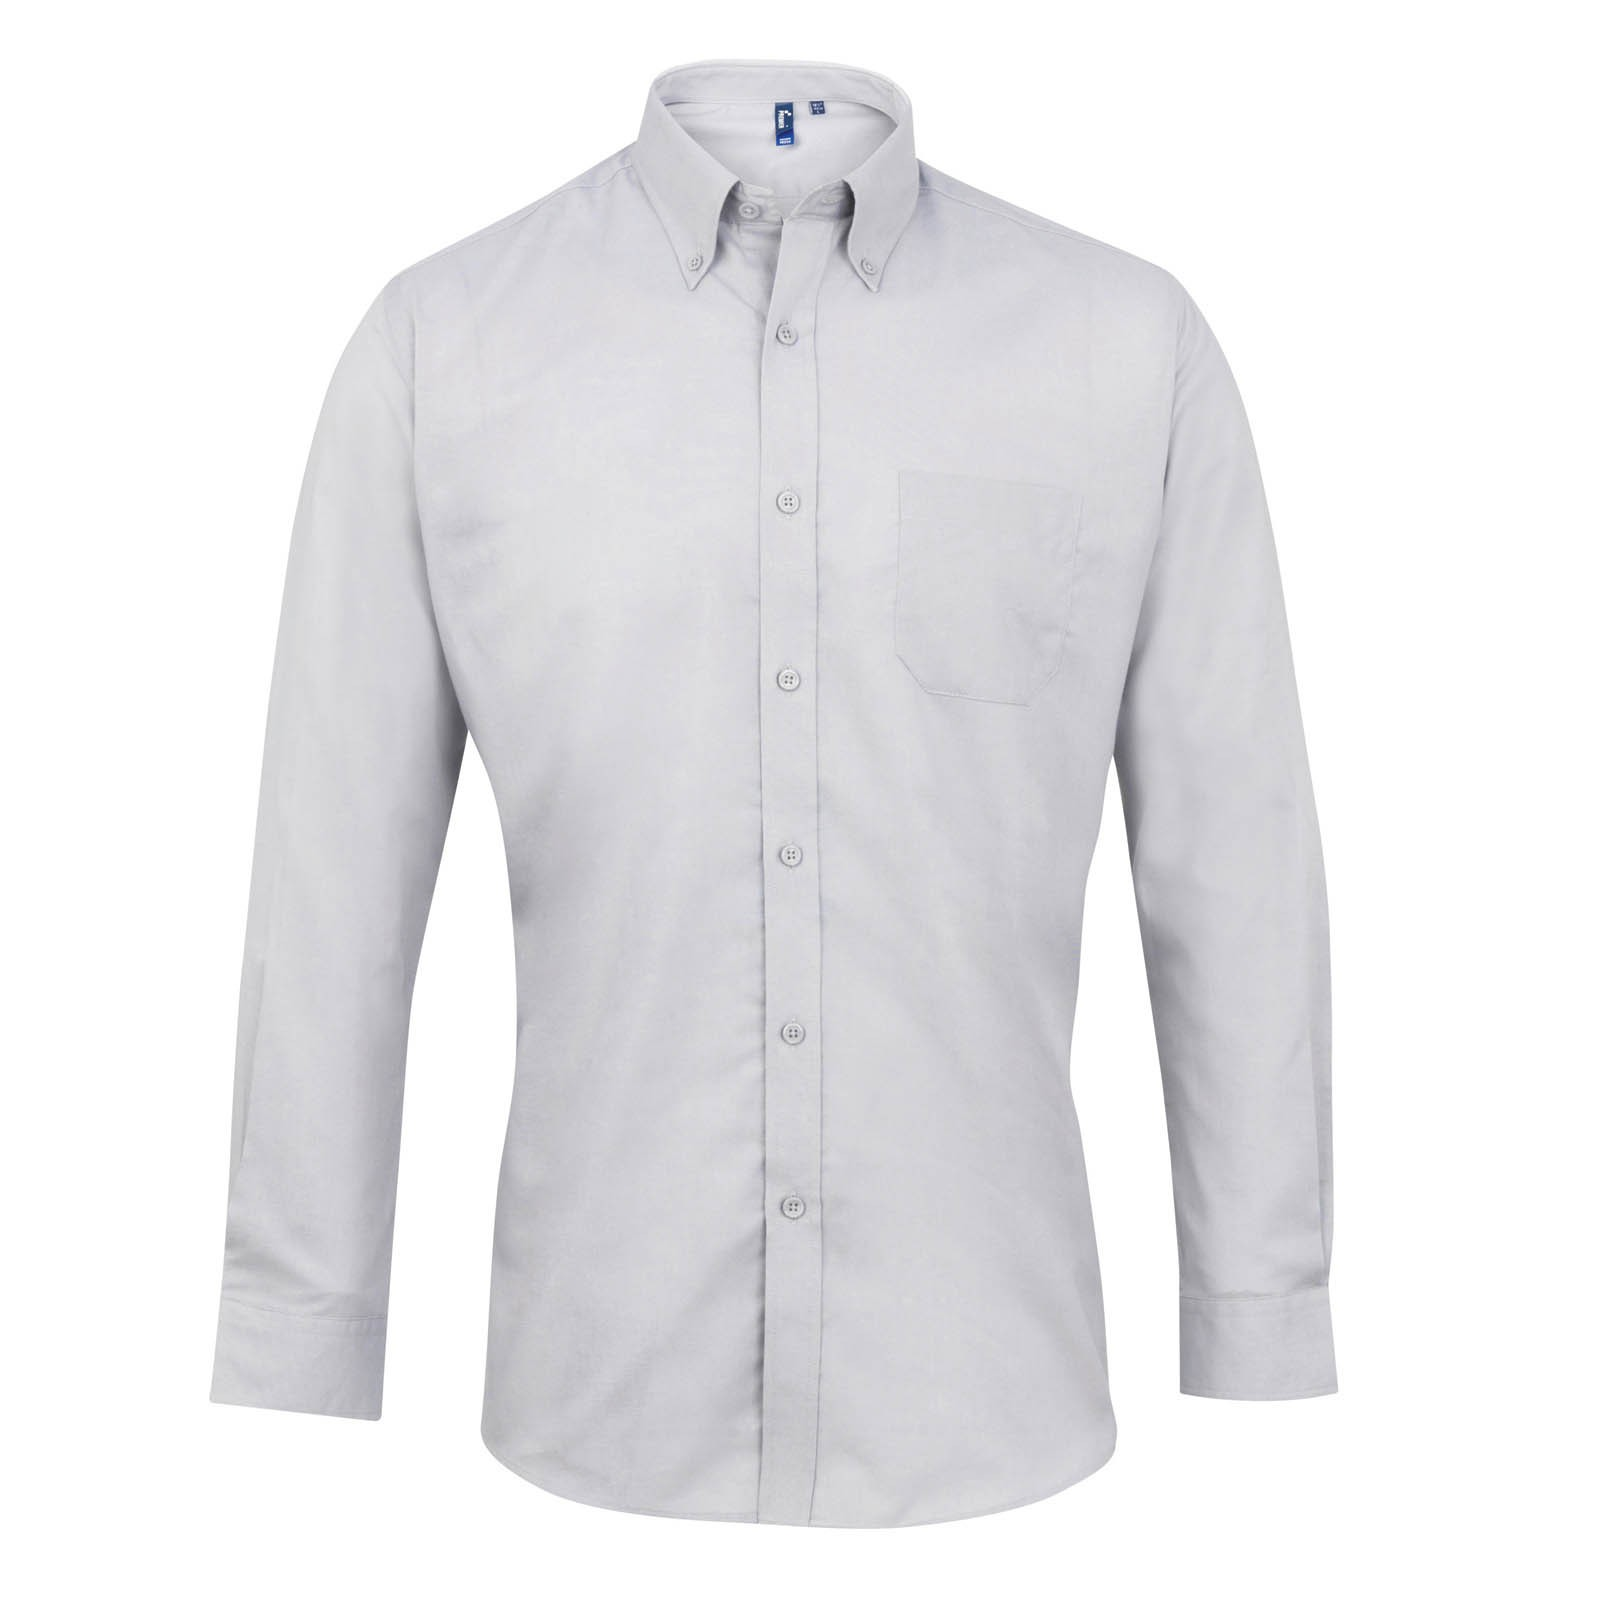 0aef8553e2f Premier Signature Long Sleeve Oxford Shirt - Long Sleeve Oxford ...